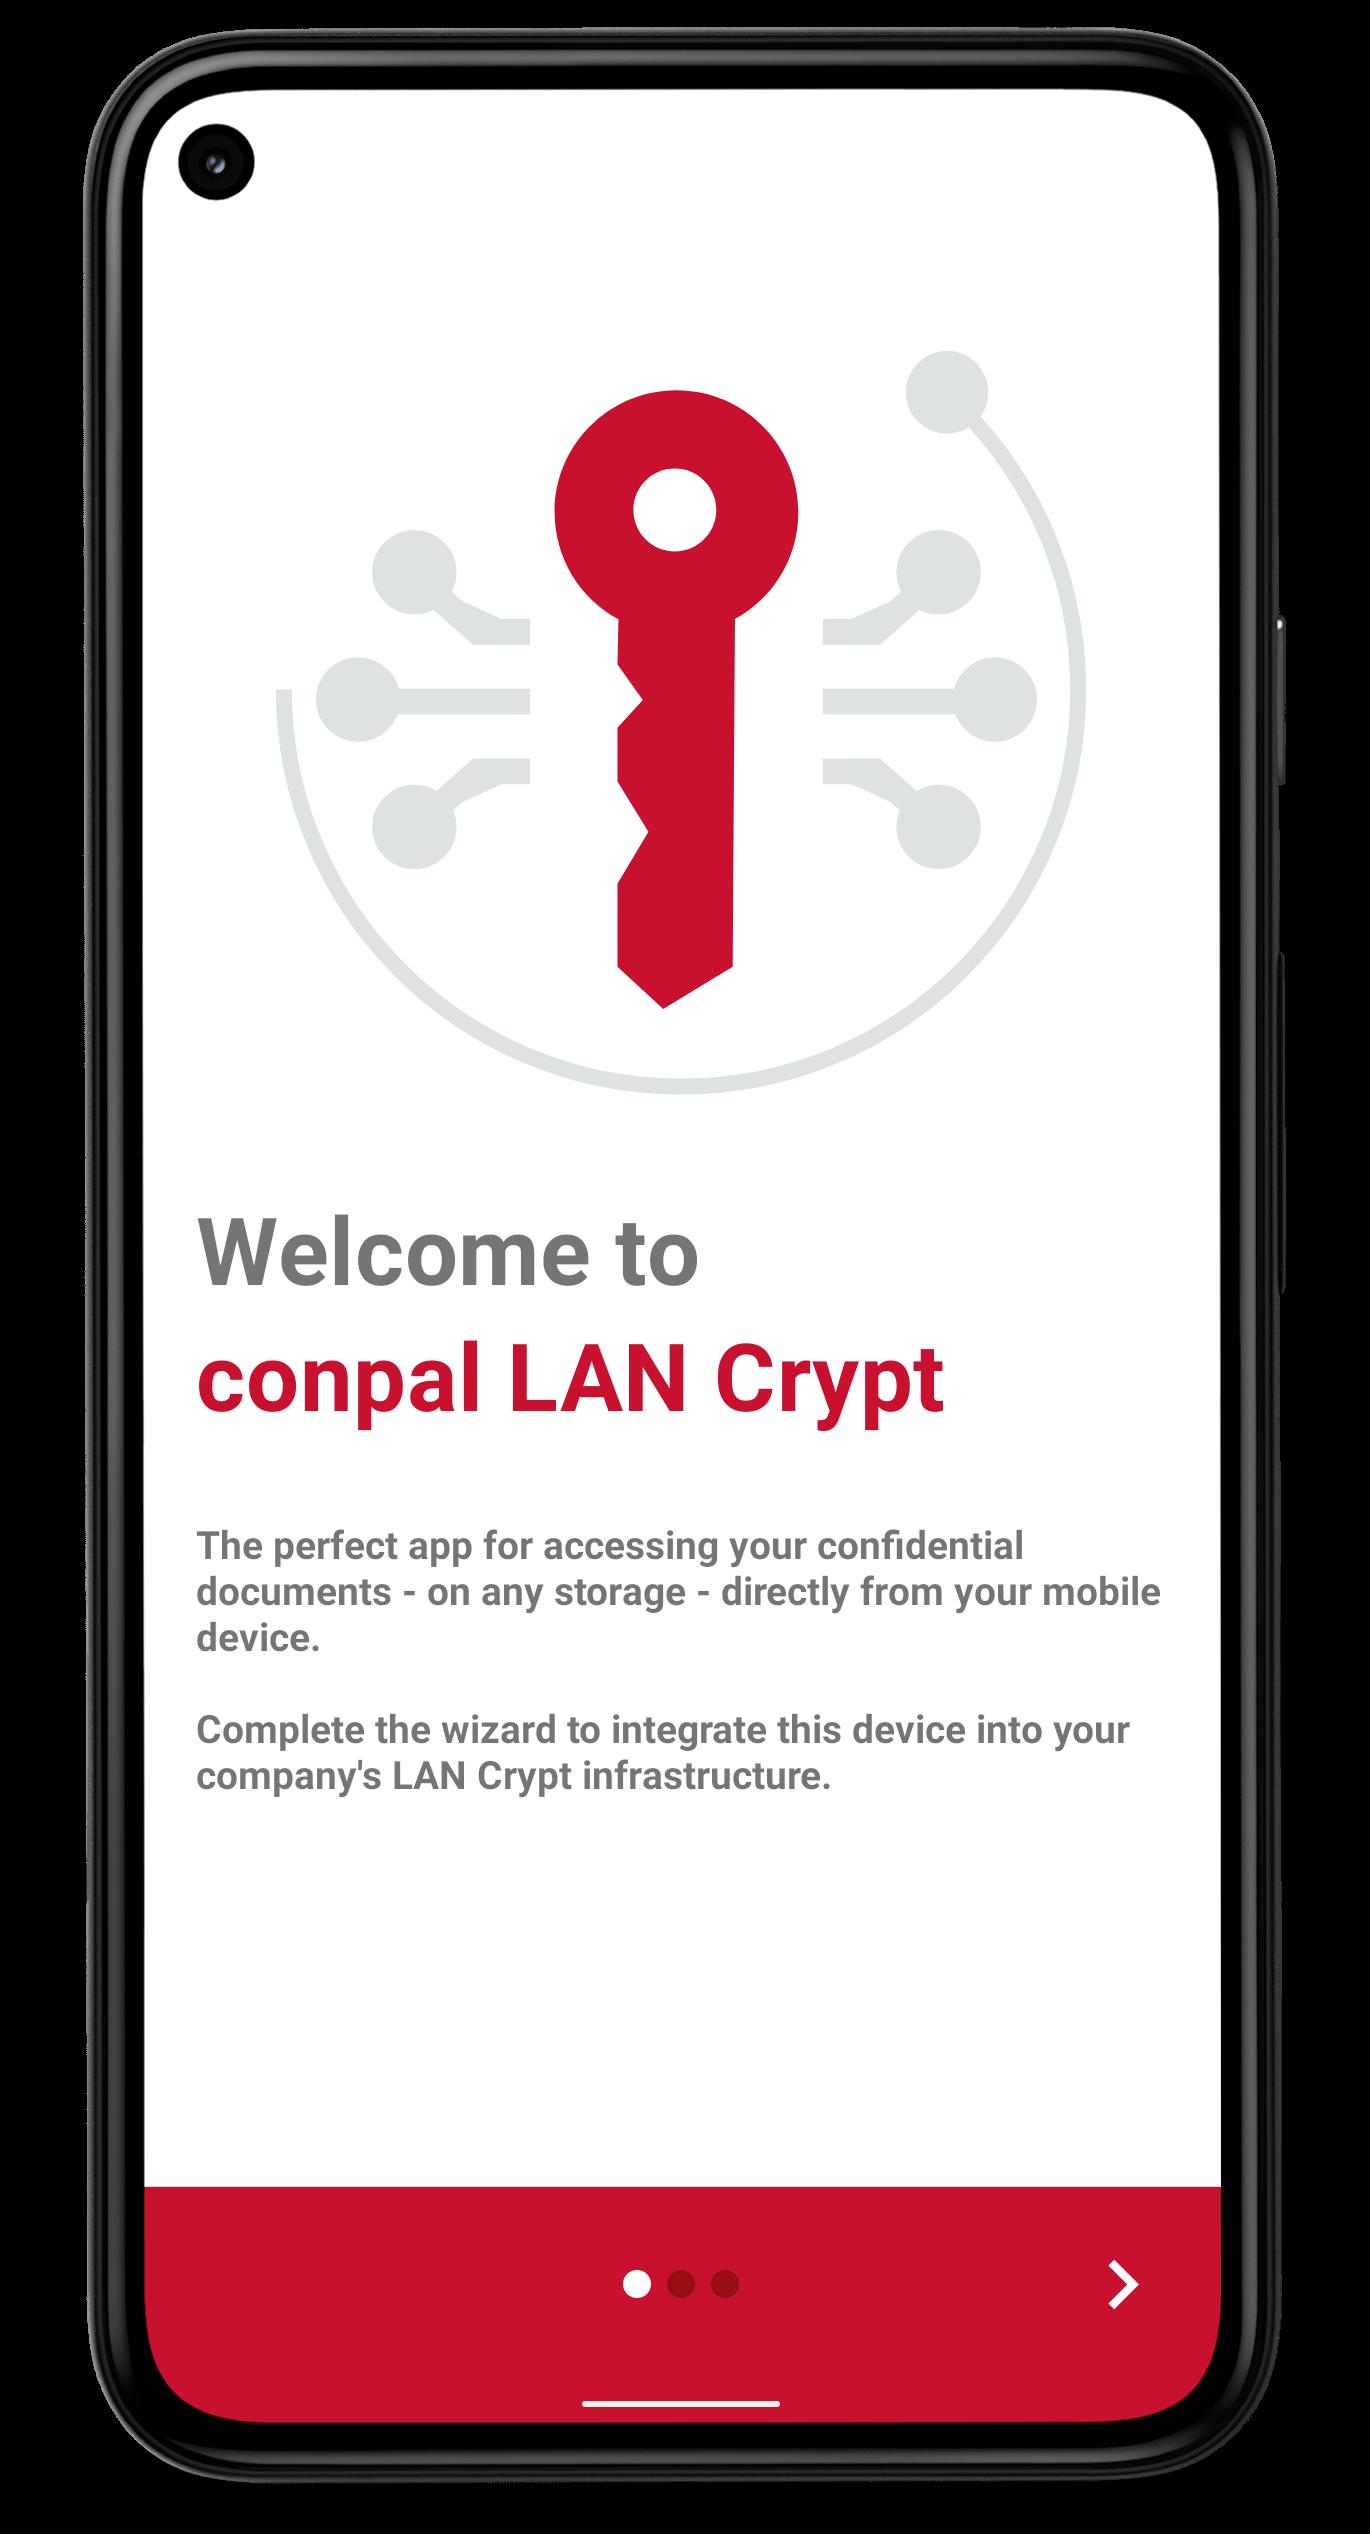 https://www.conpal.de/de/wp-content/uploads/2021/05/EN_iOS_V1_Welcome.png